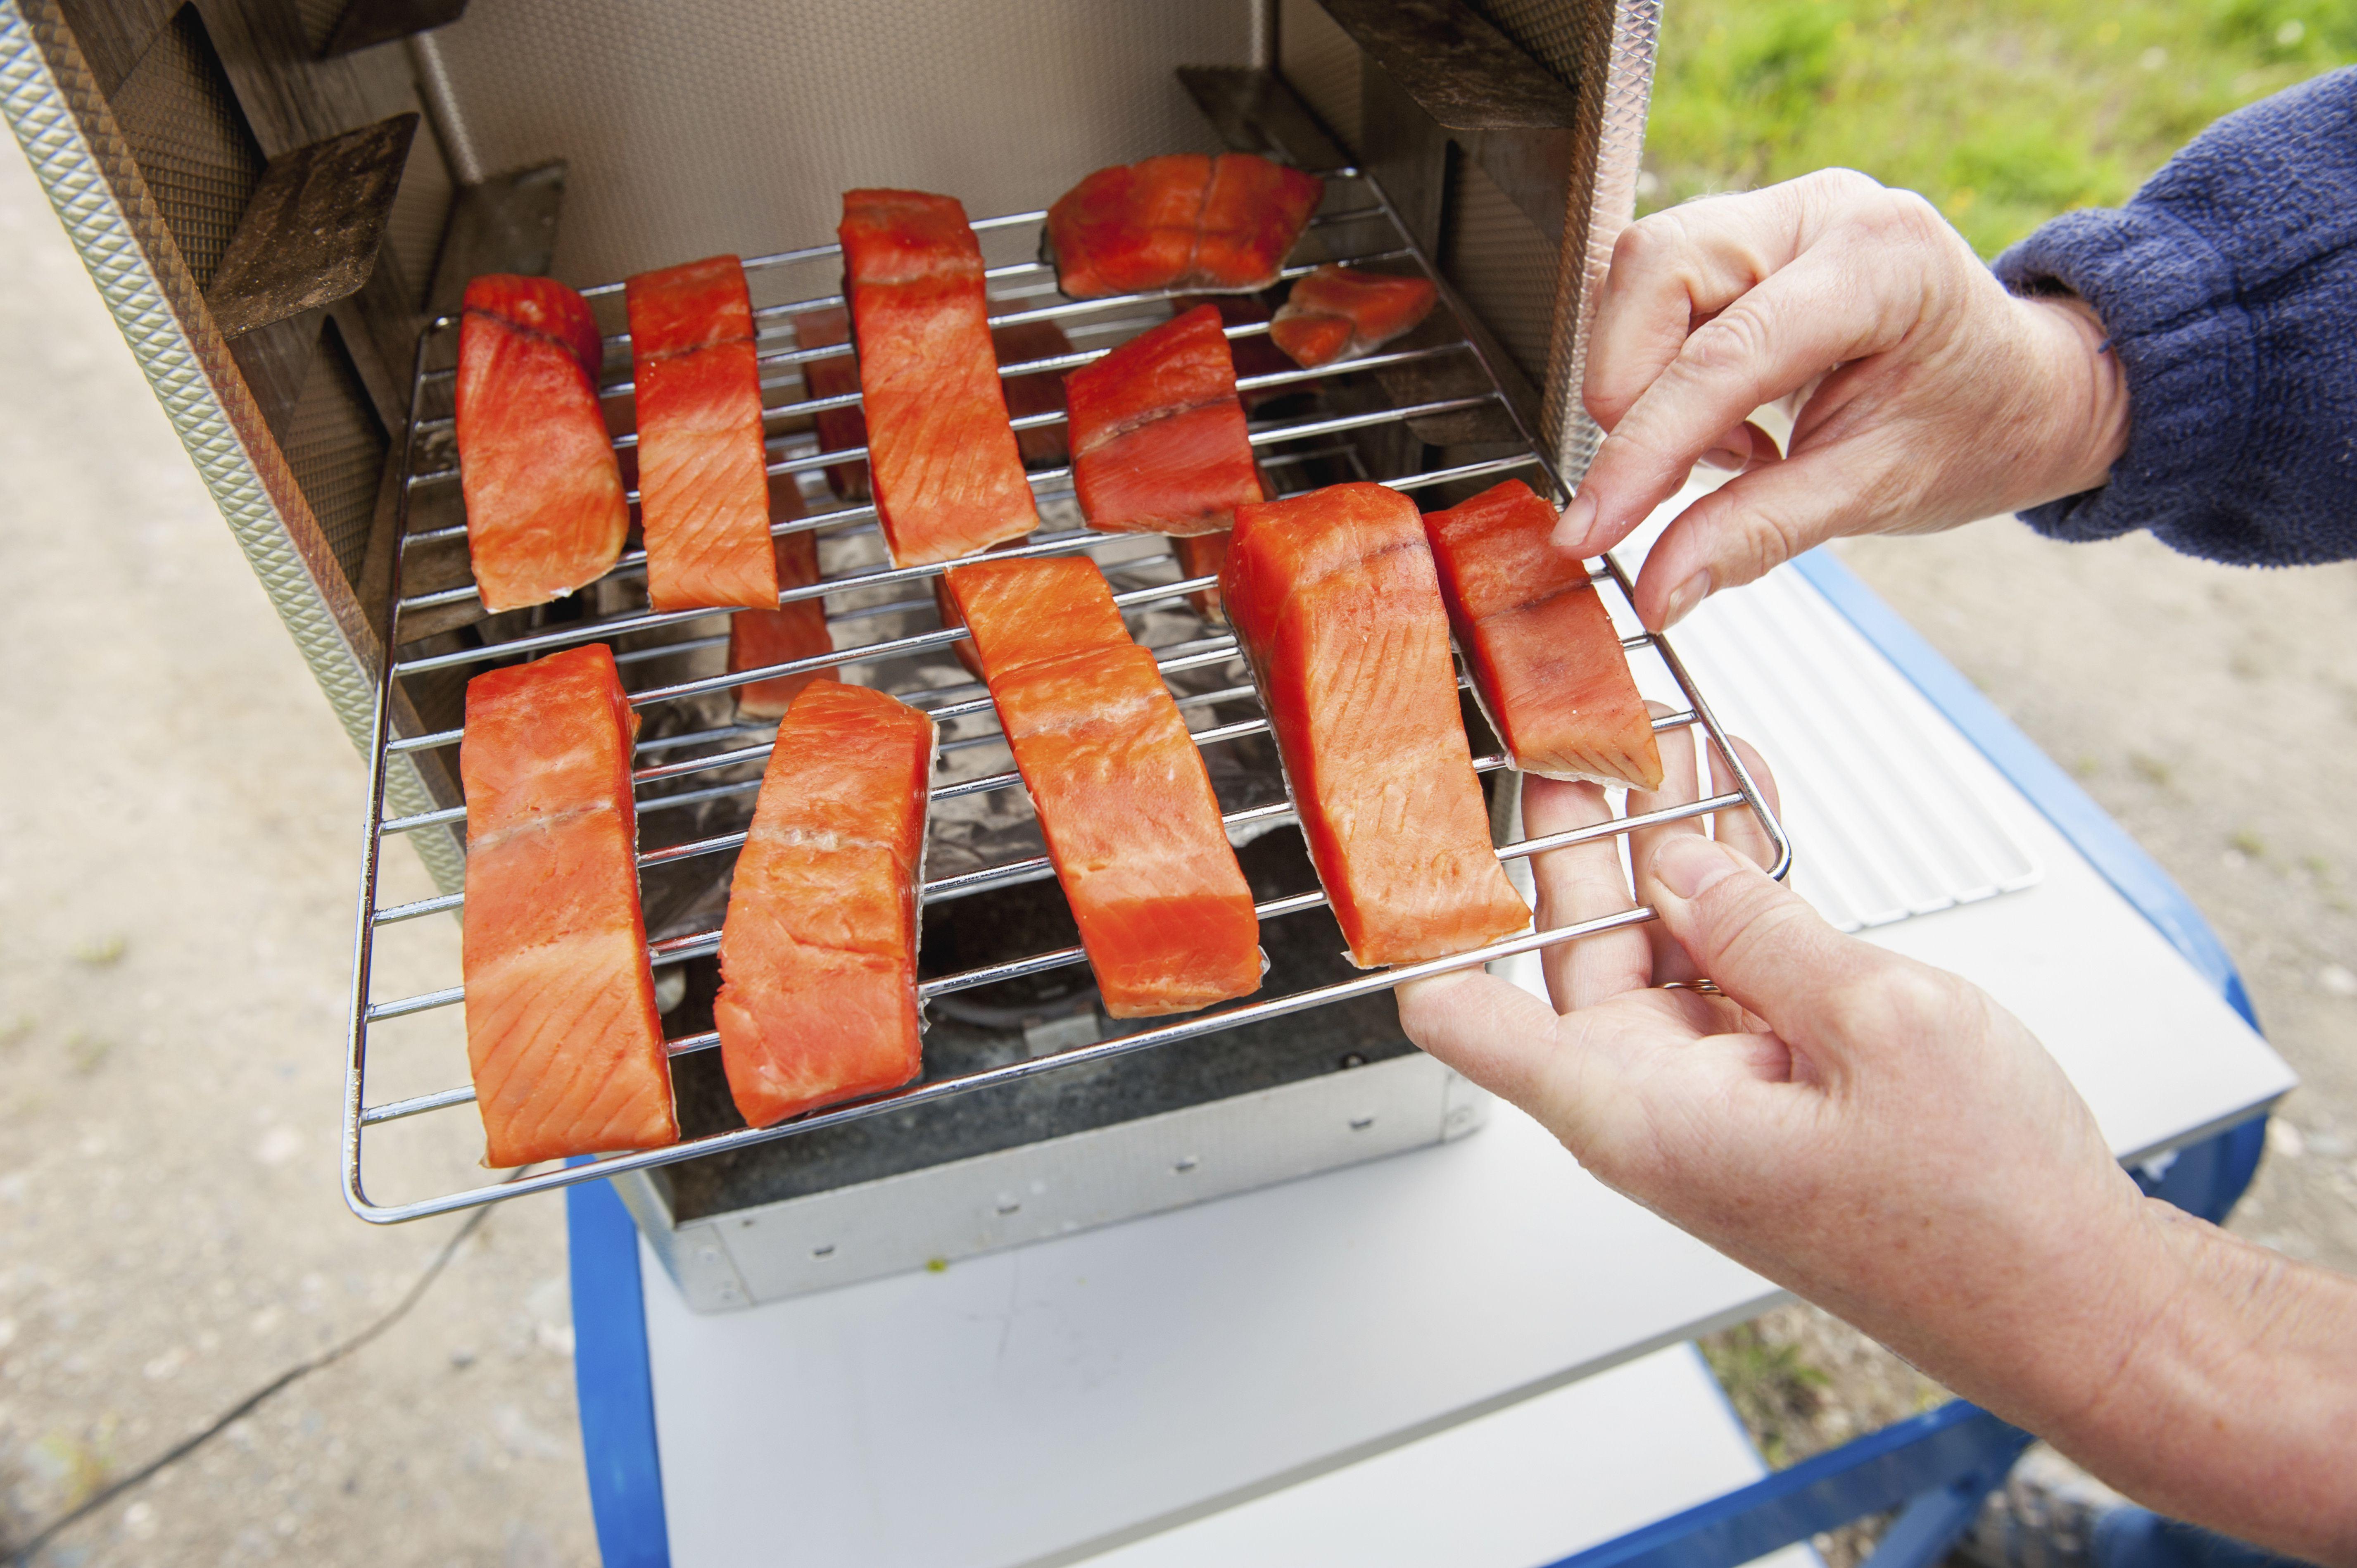 Person loading a smoker with prepared salmon, Alaska